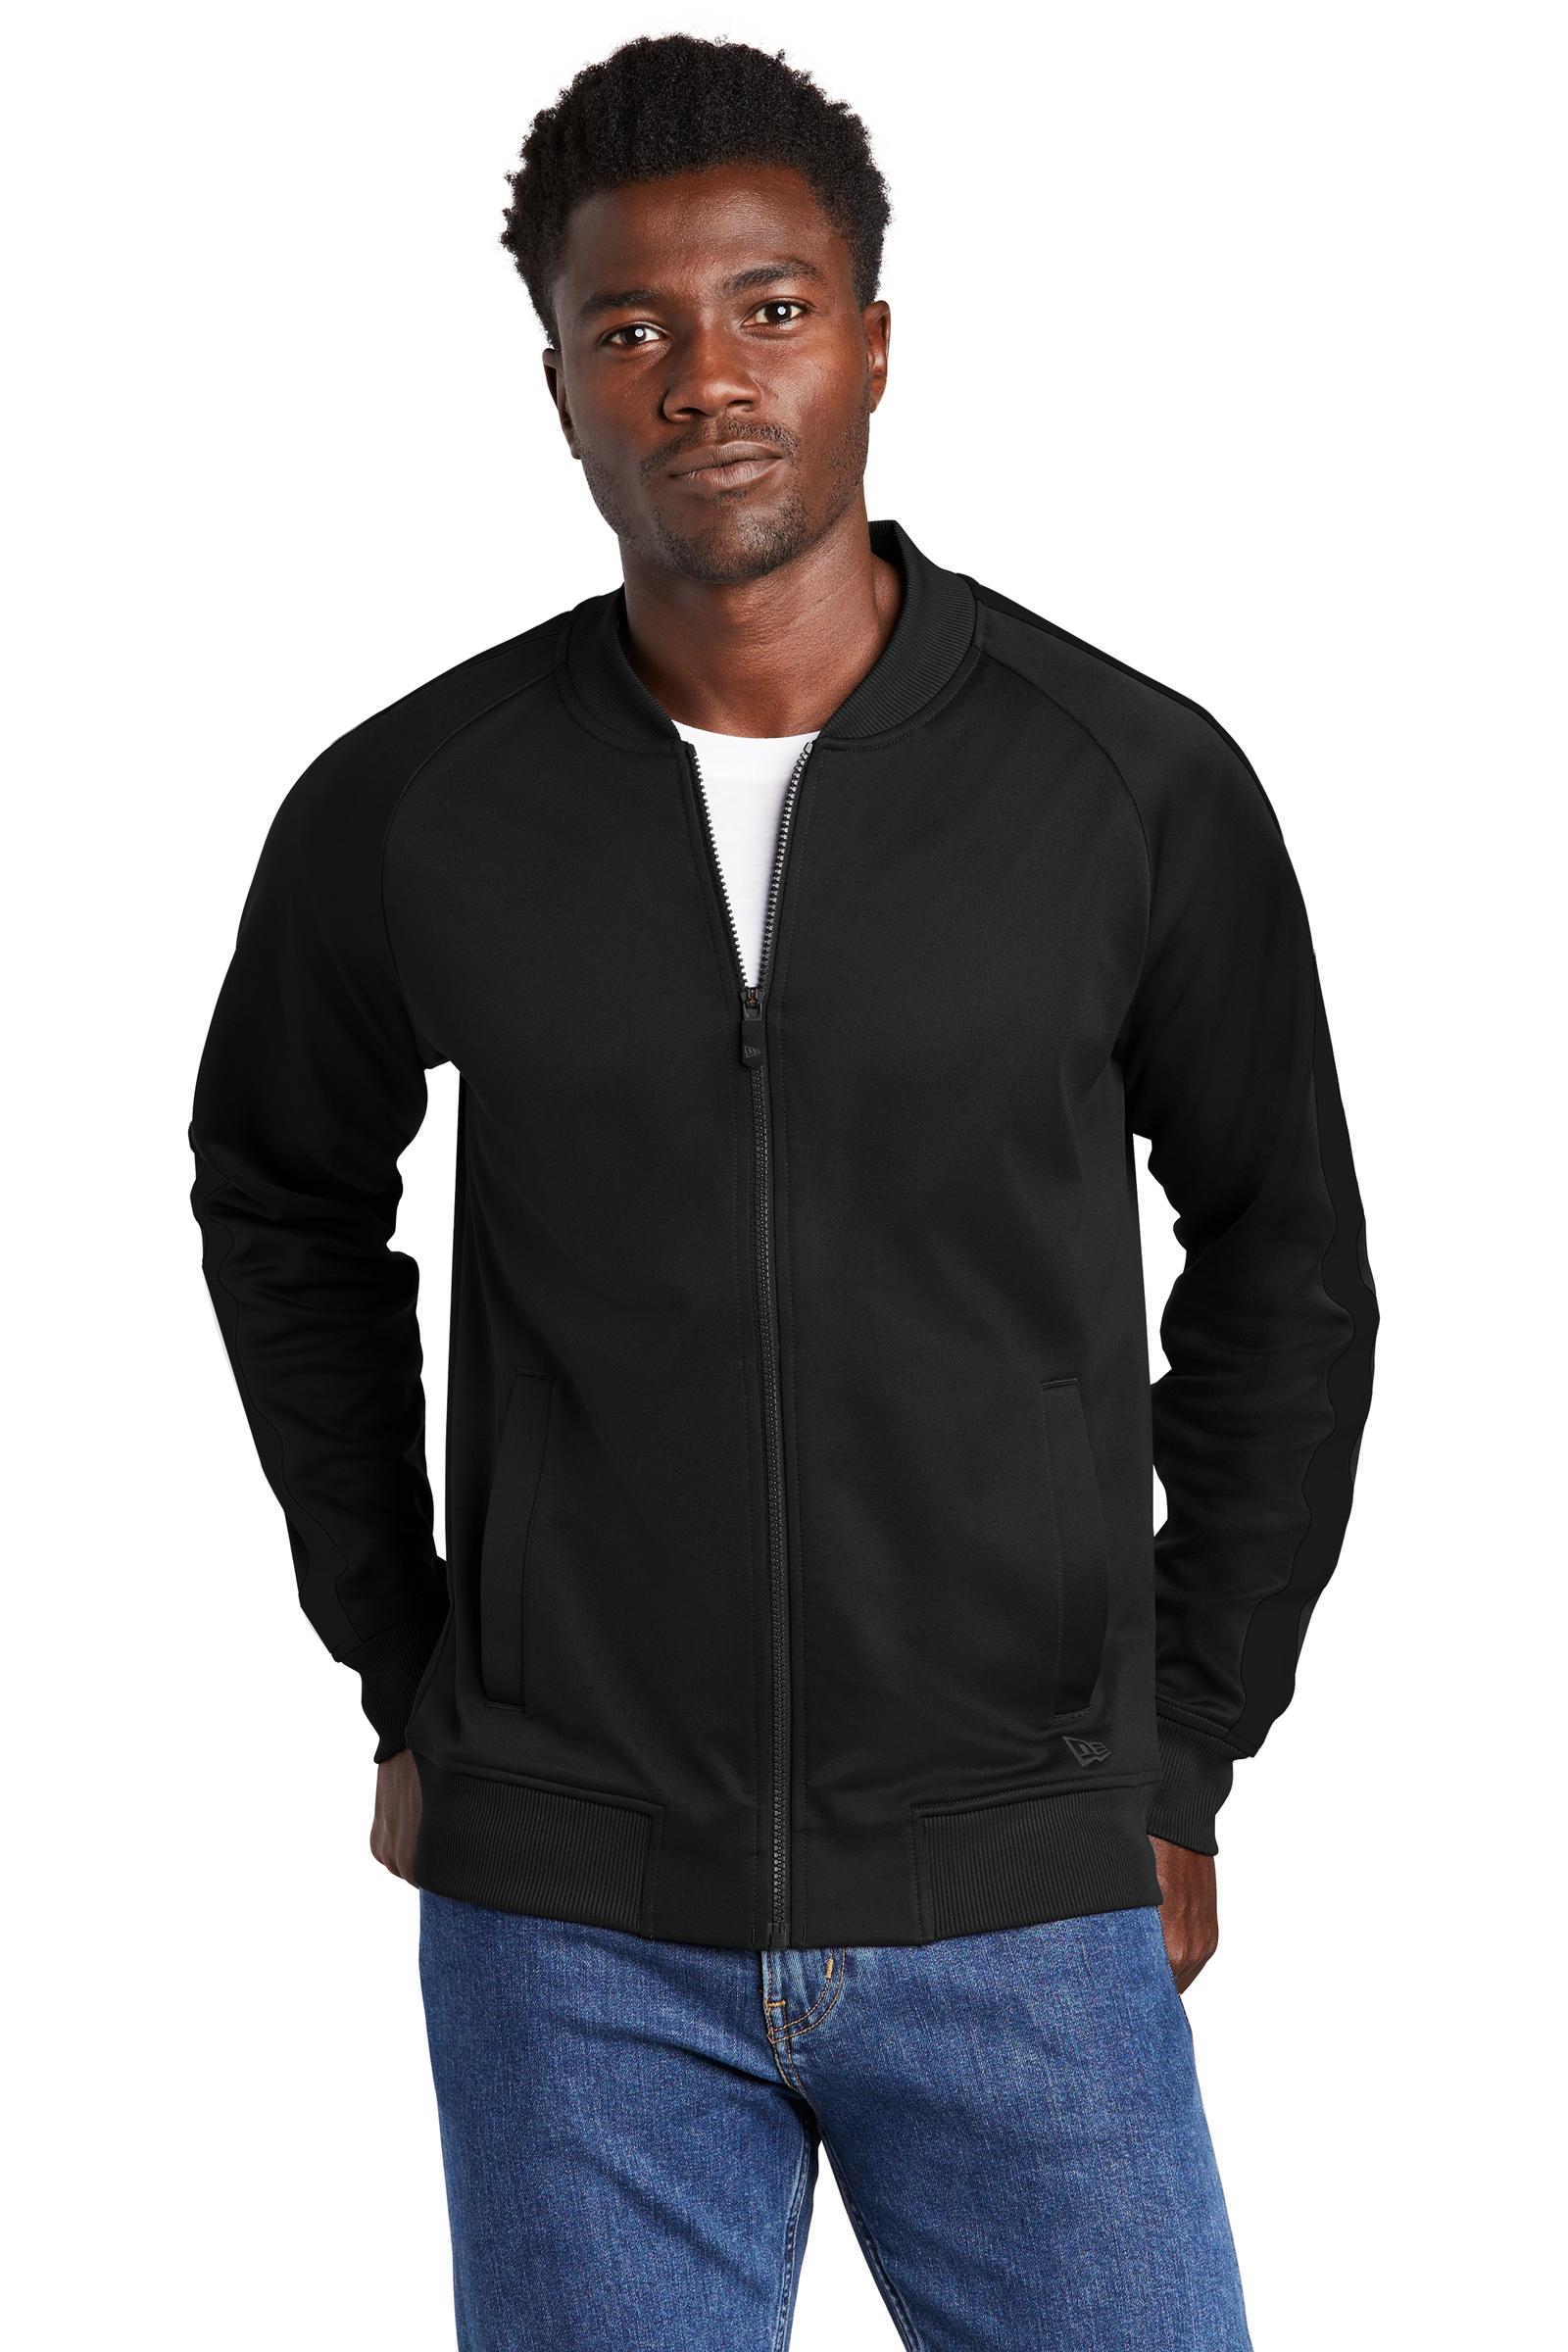 New Era Embroidered Men's Track Jacket